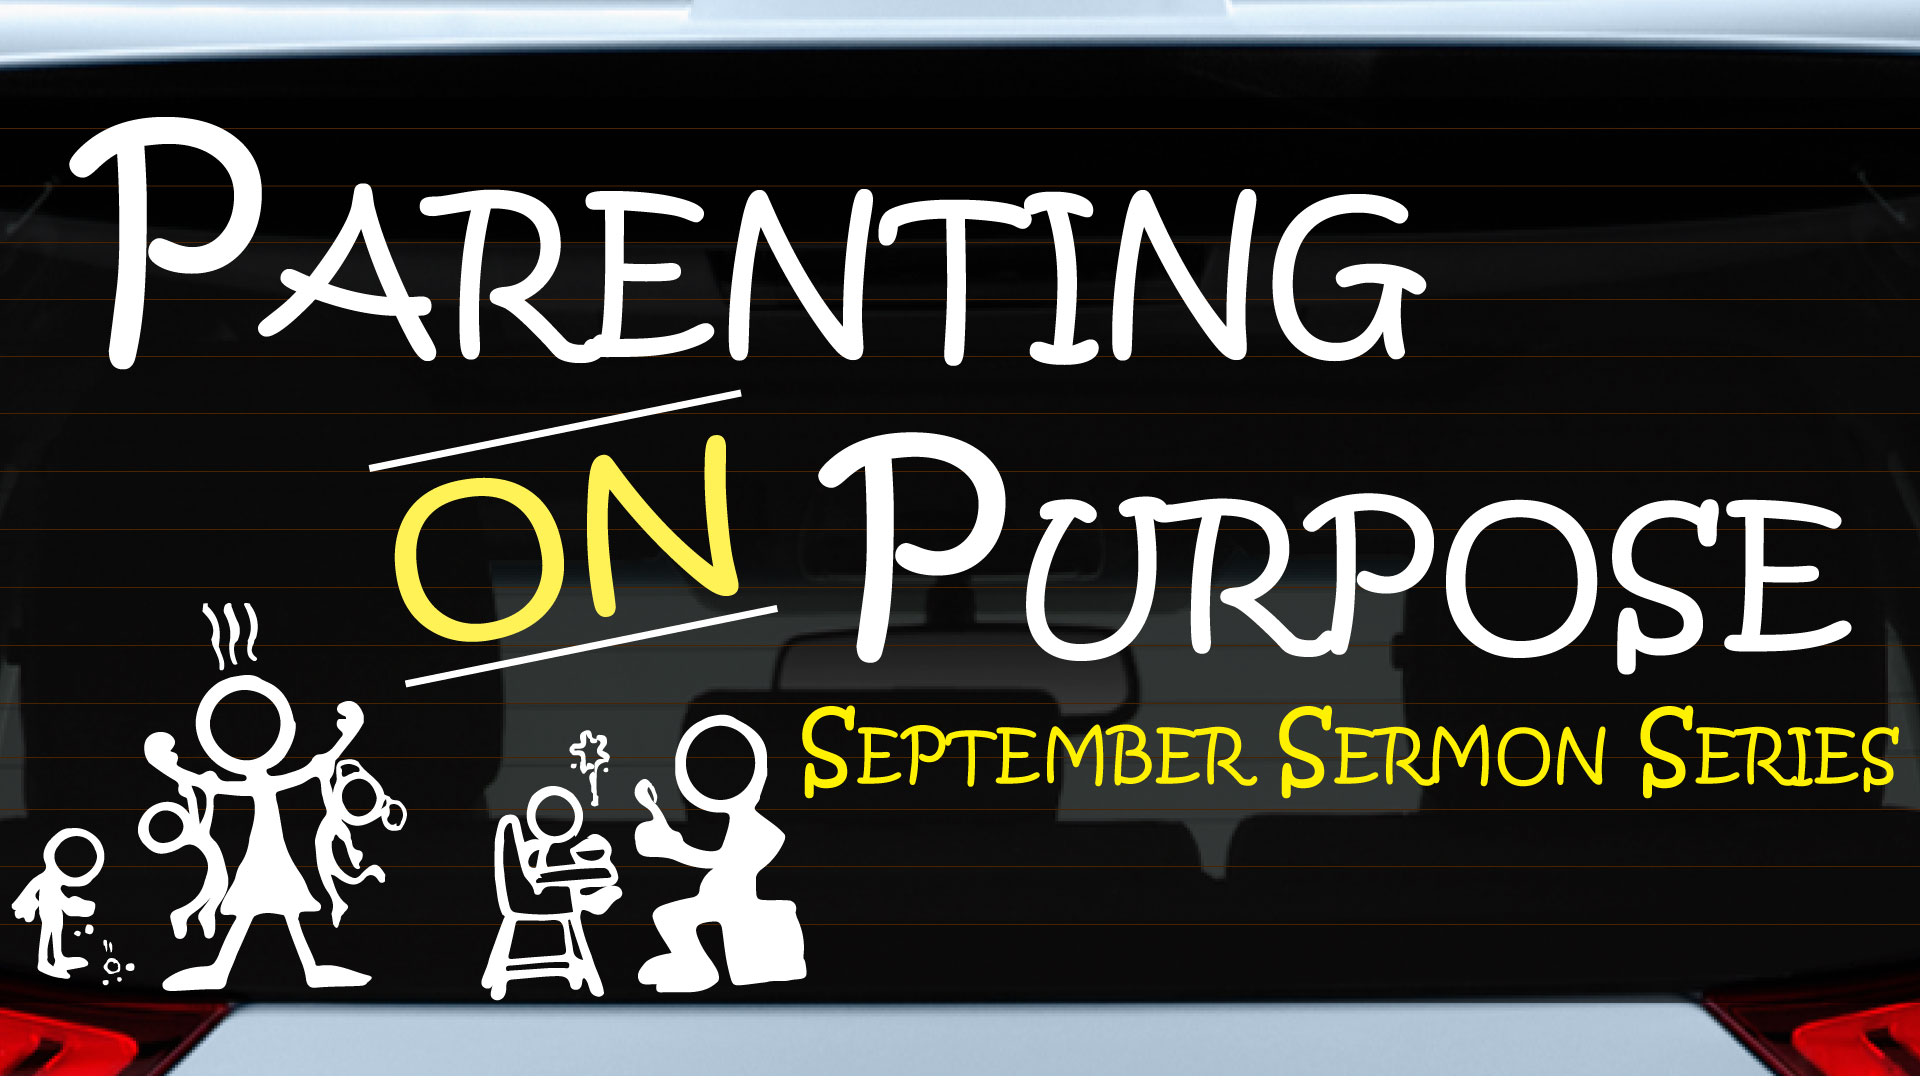 Parenting-On-Purpose-Logo.jpg